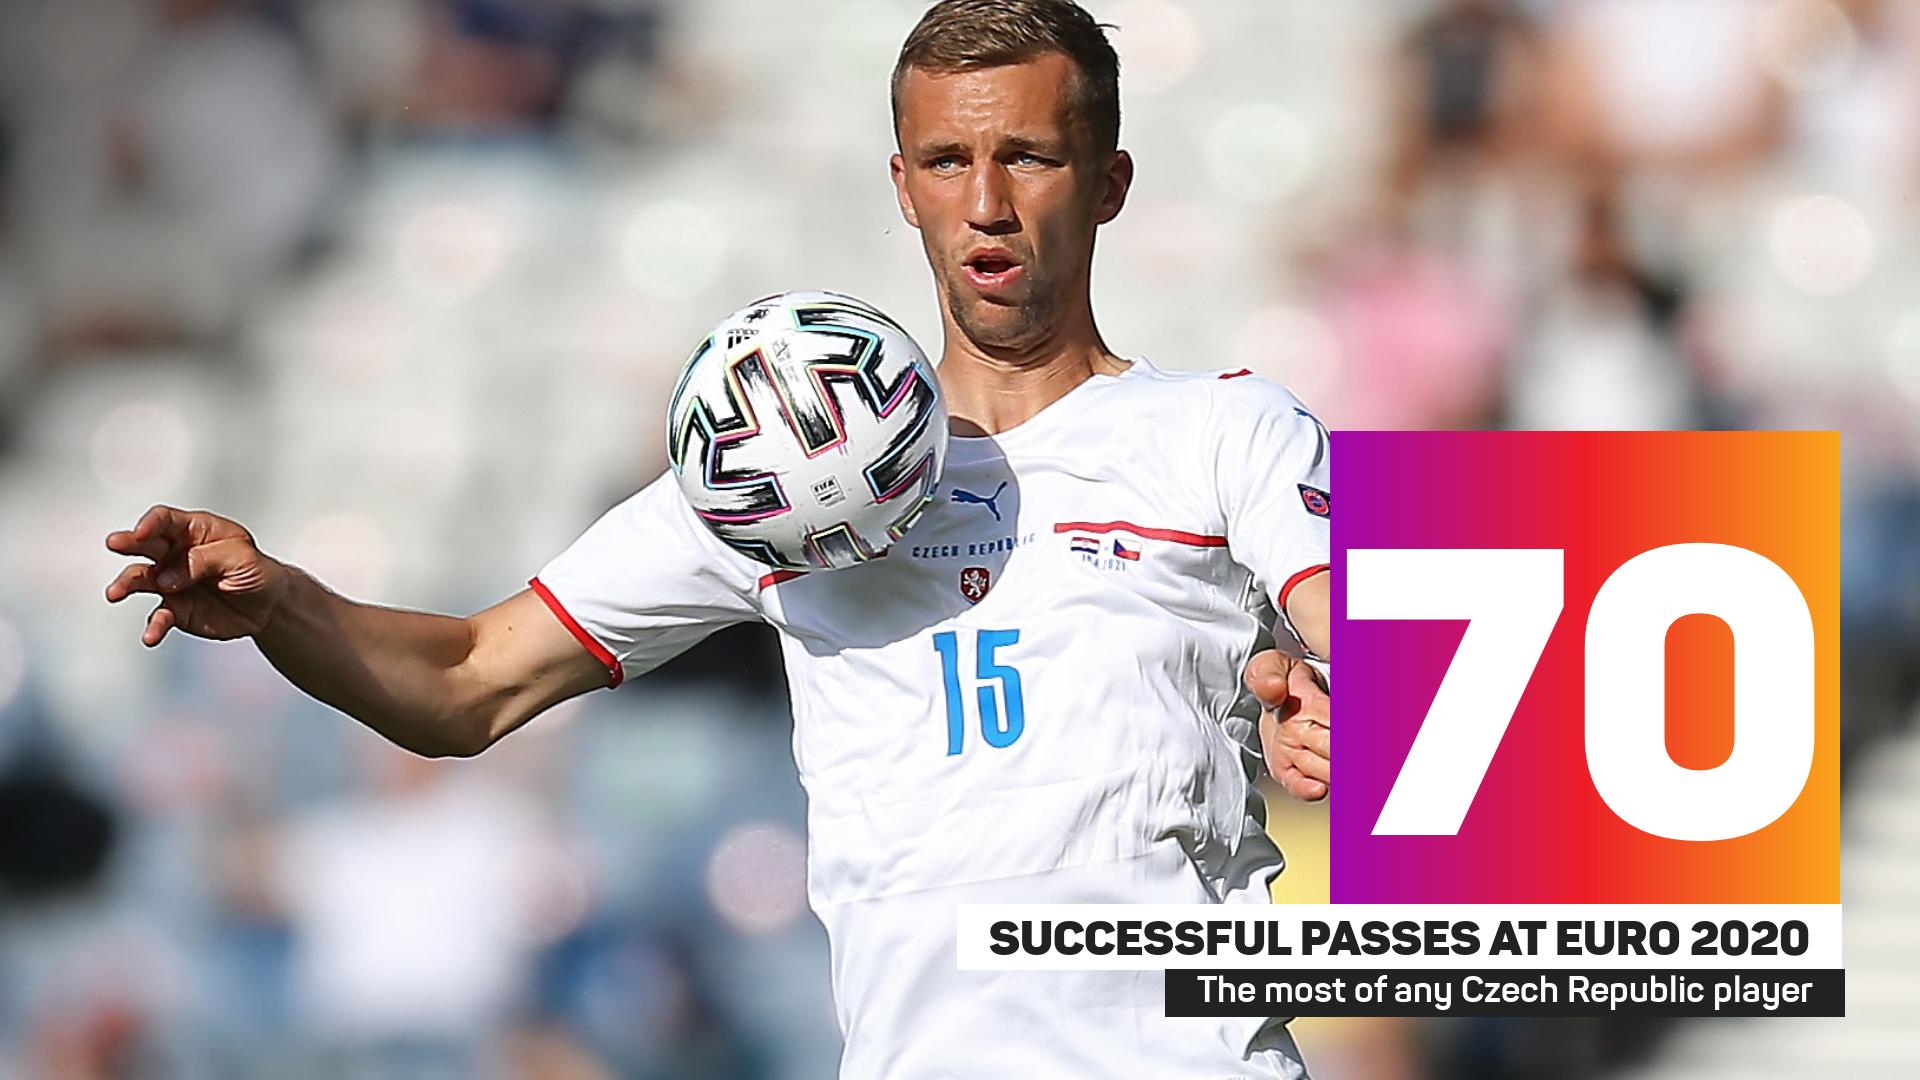 Tomas Soucek passes Euro 2020